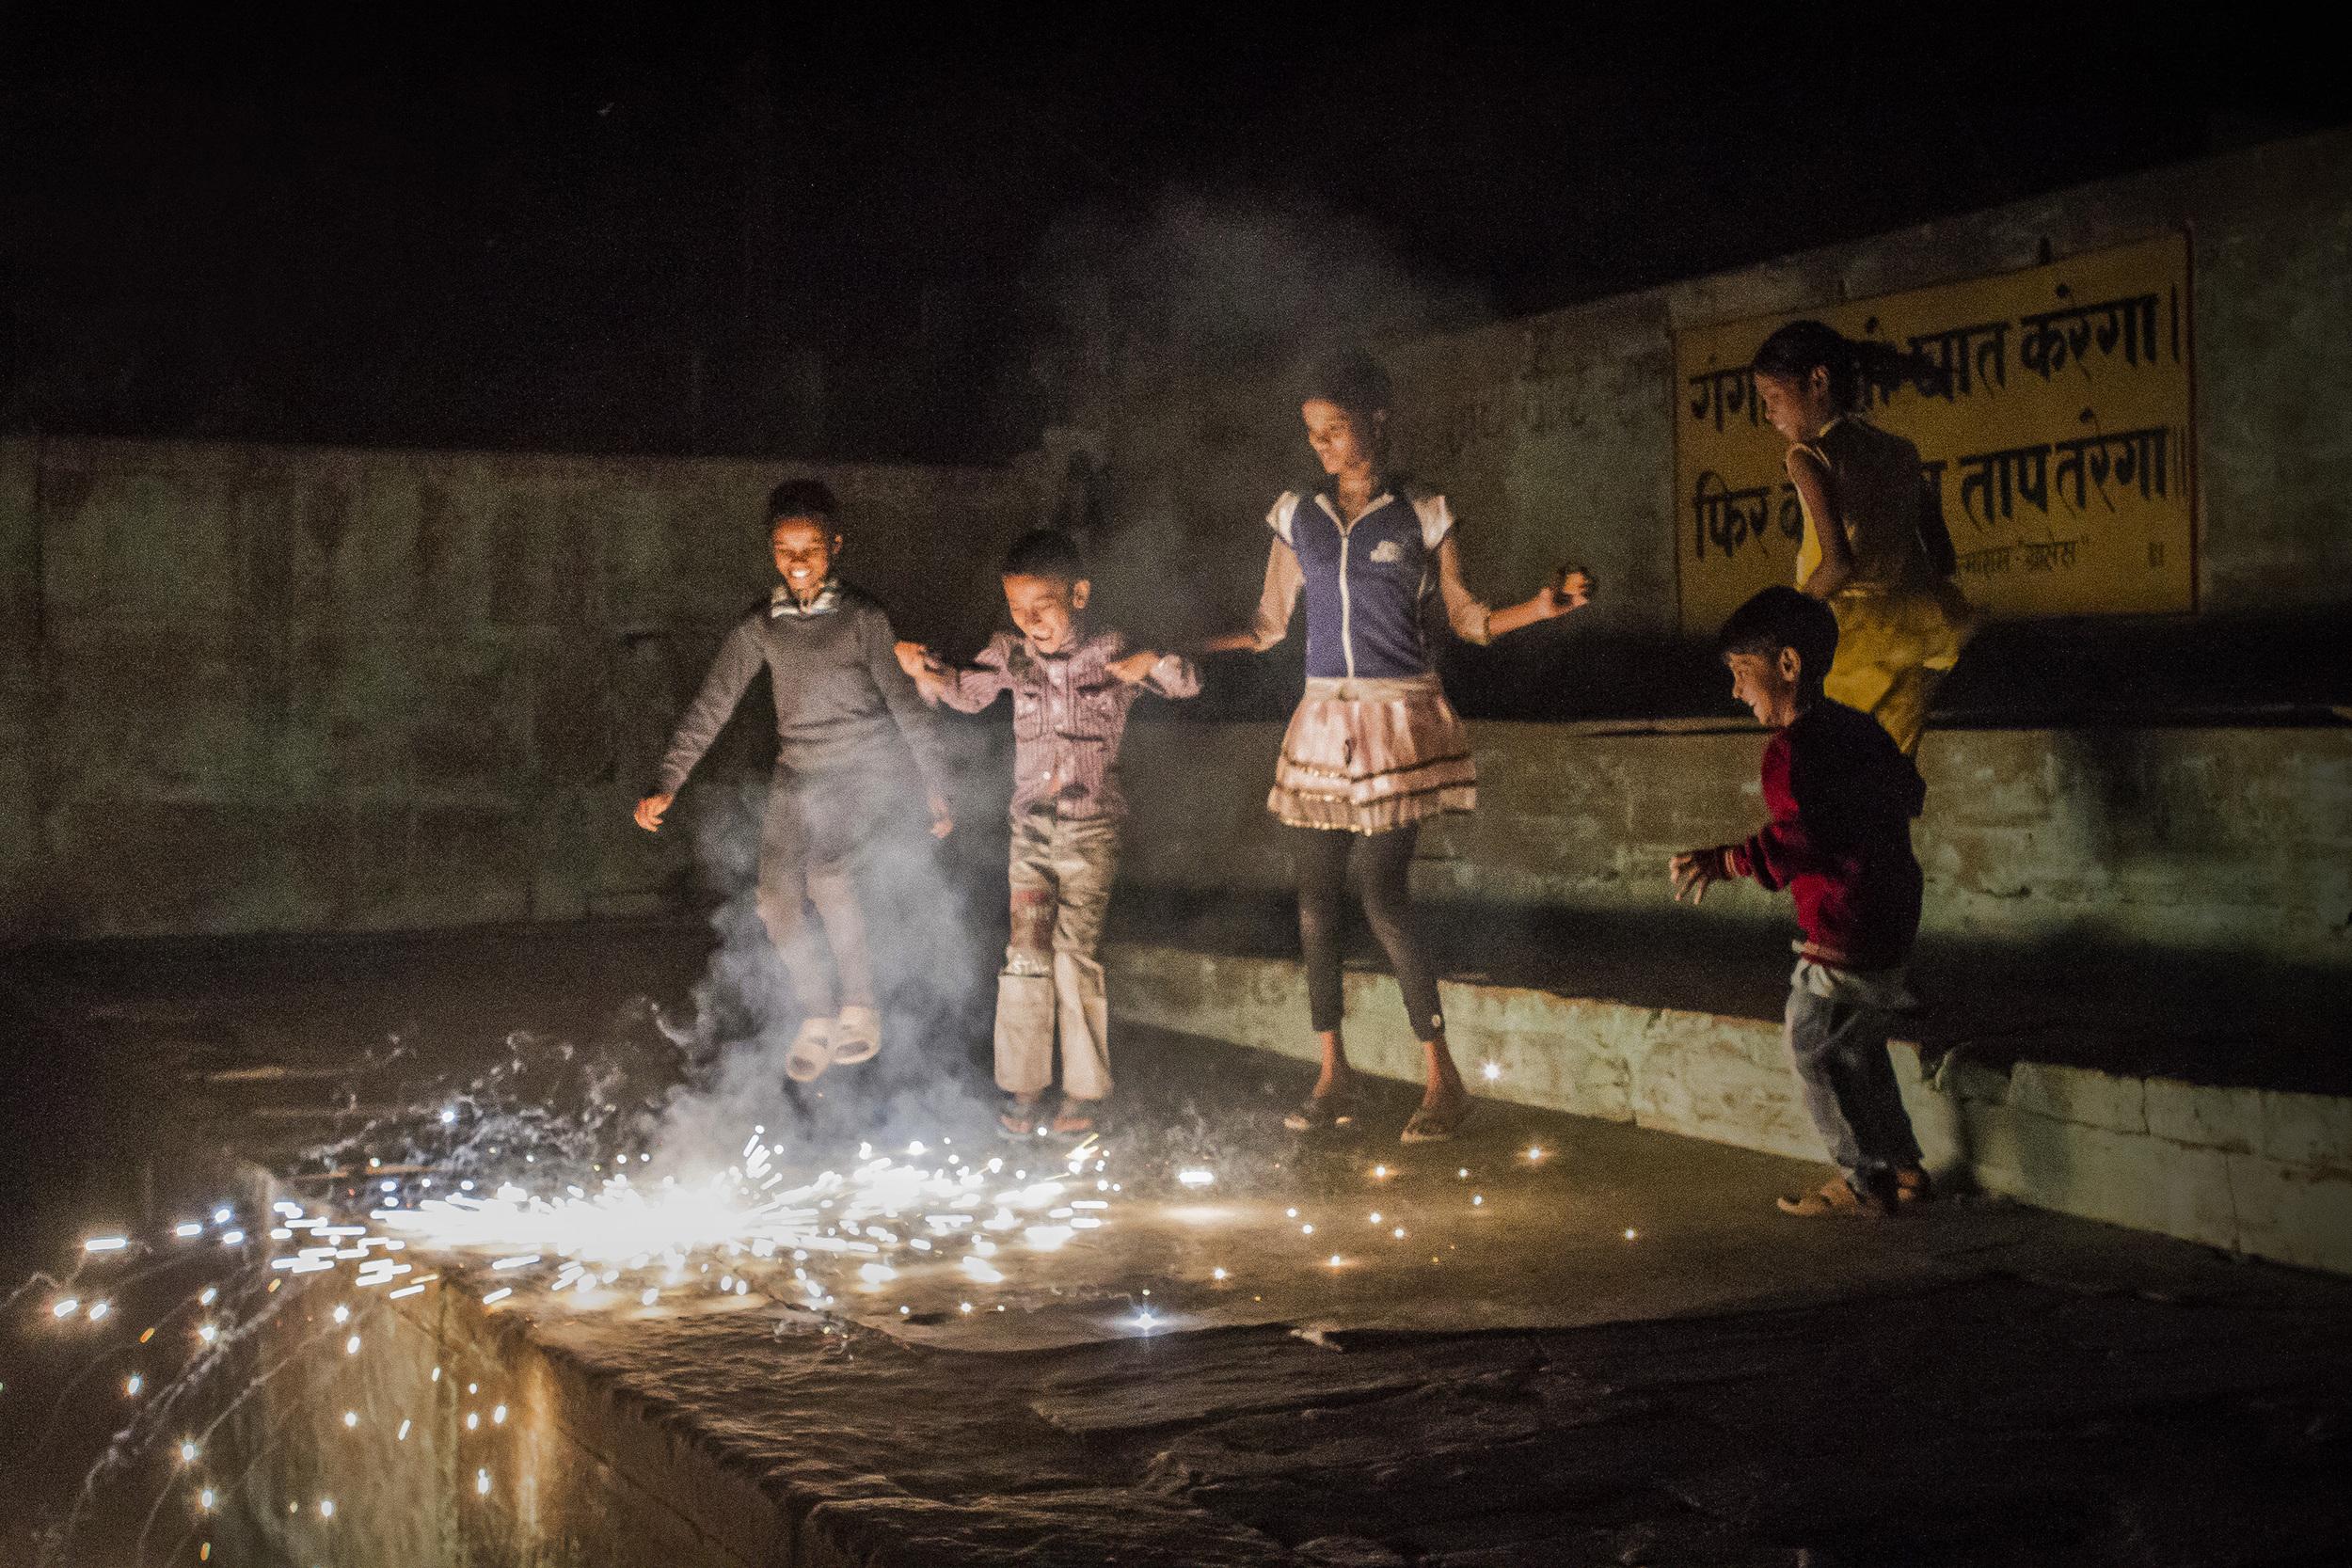 13 November, 2012 - Varanasi   Children celebrate Diwali with fireworks on the banks of the Ganges